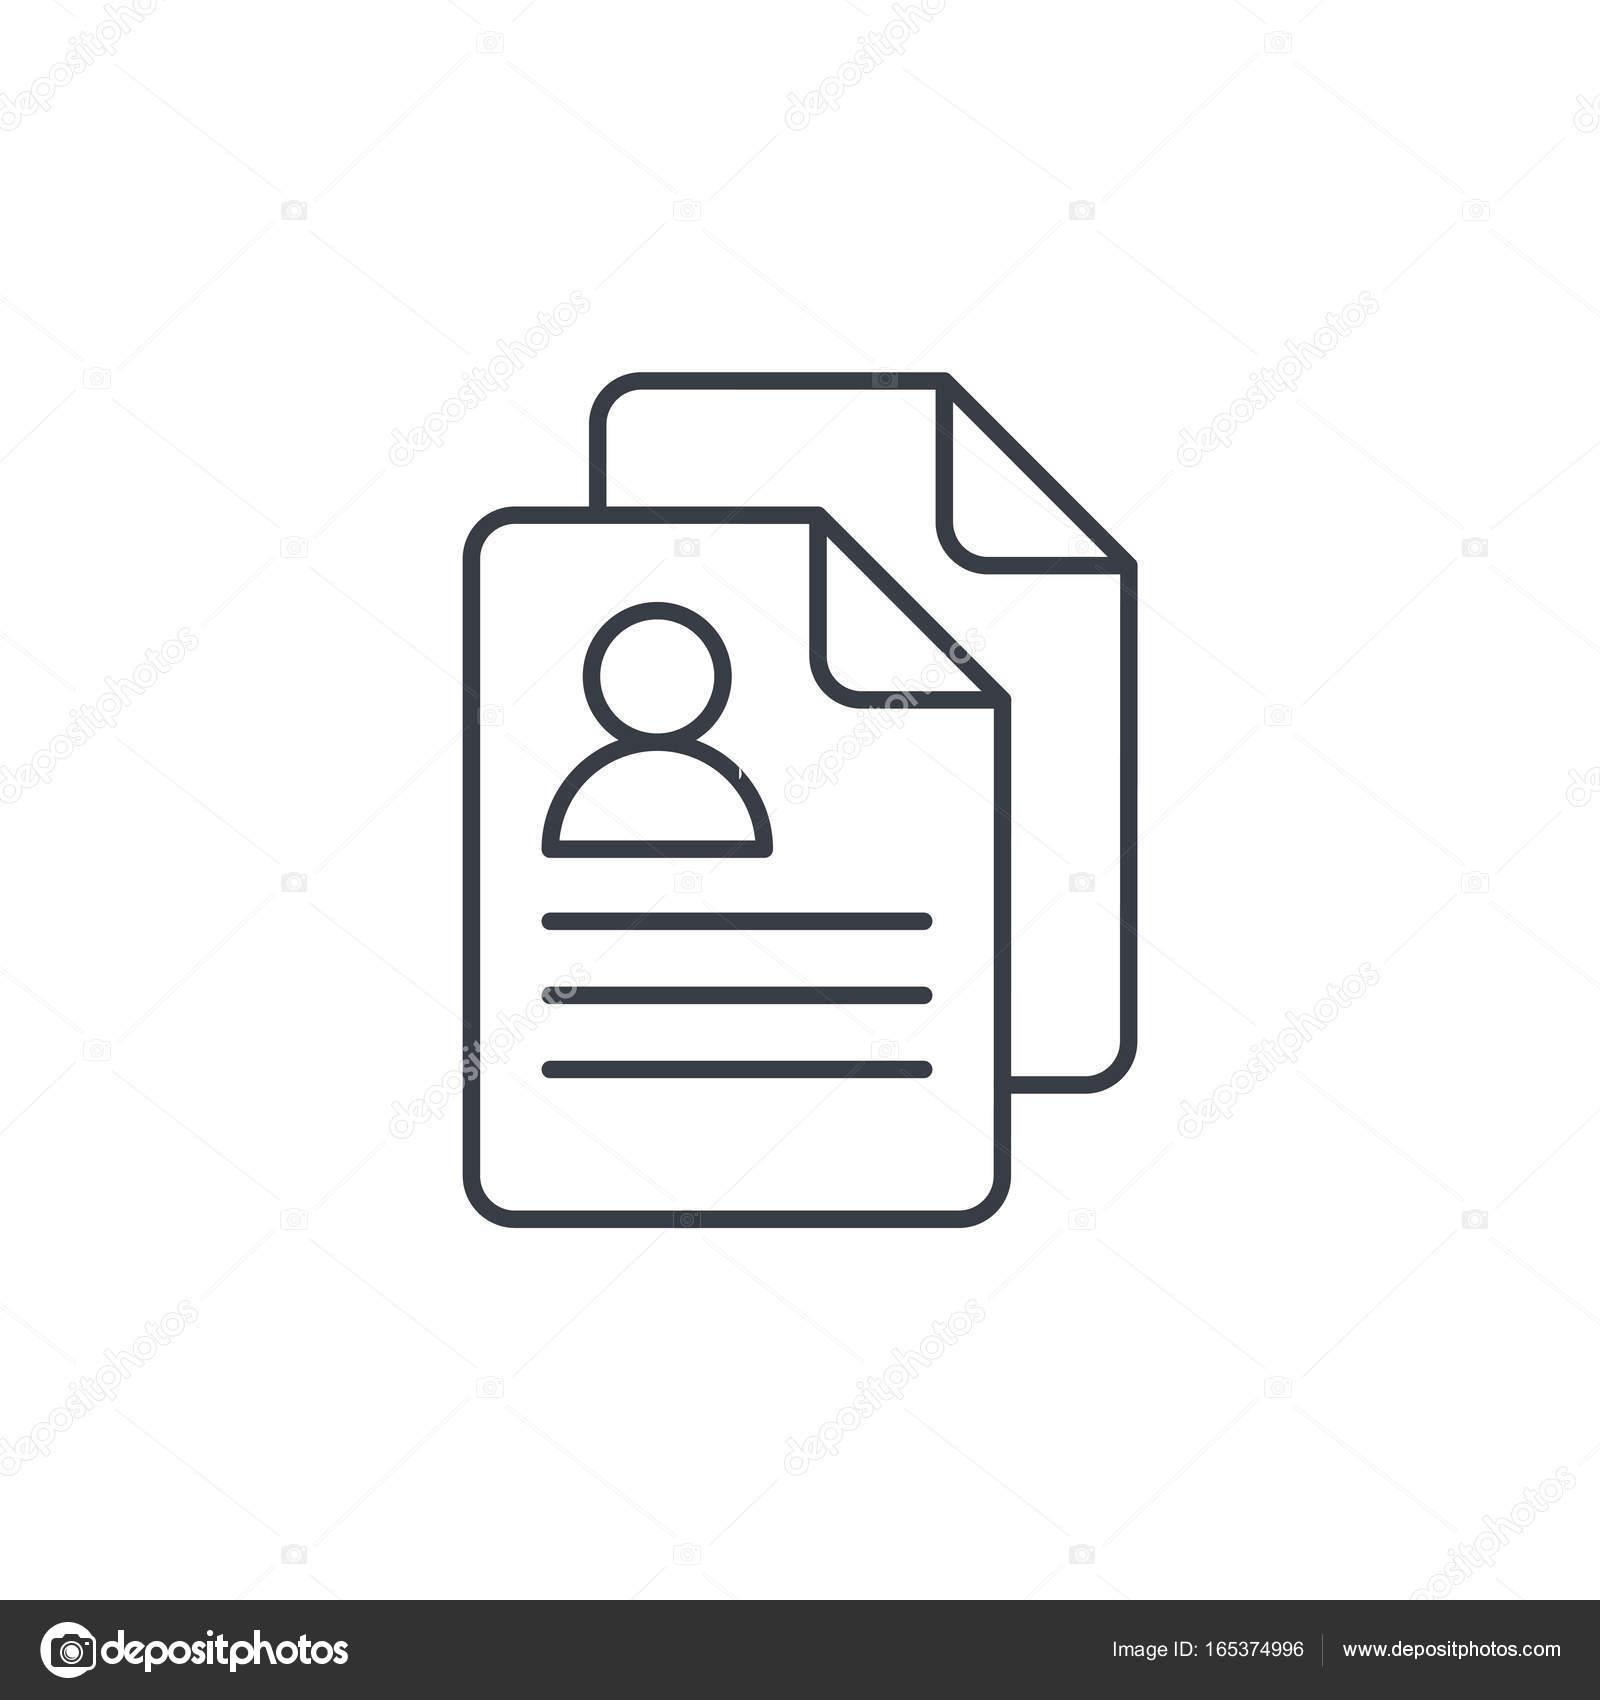 social-Media-Benutzerbild, Rekrutierung, Profil, Lebenslauf ...